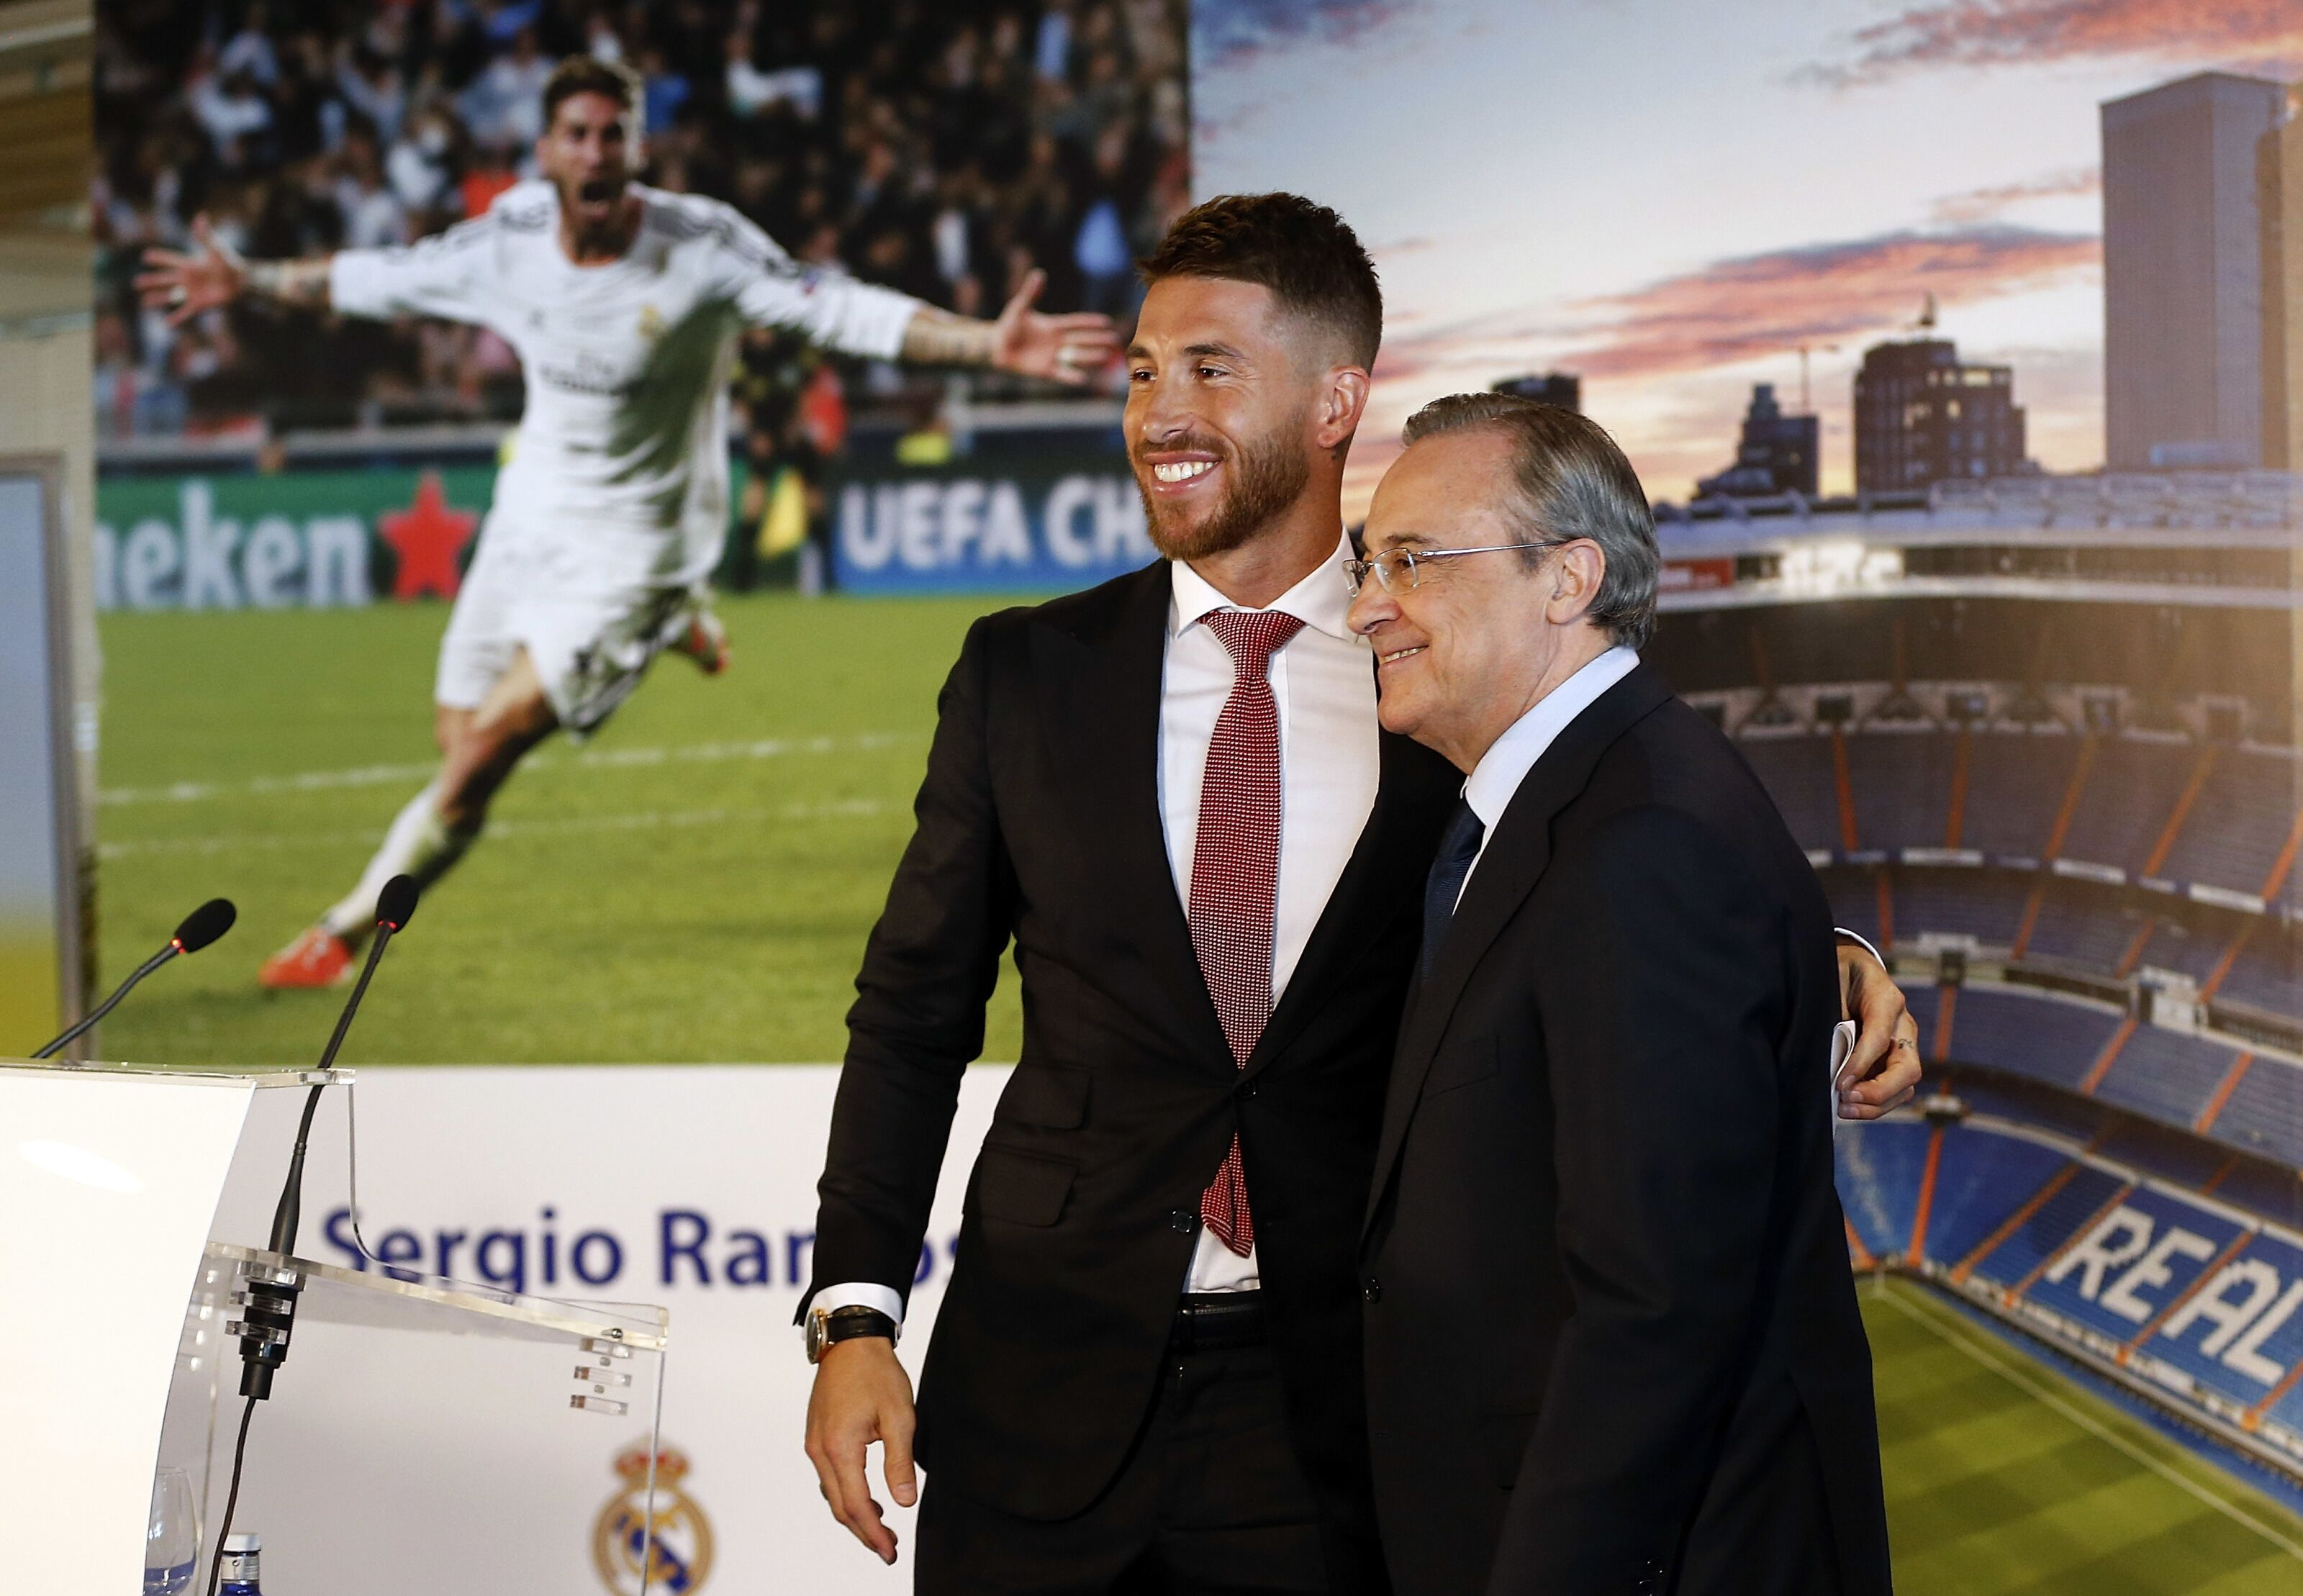 Real Madrid: Sergio Ramos and Florentino Perez veto Zinedine Zidane's target